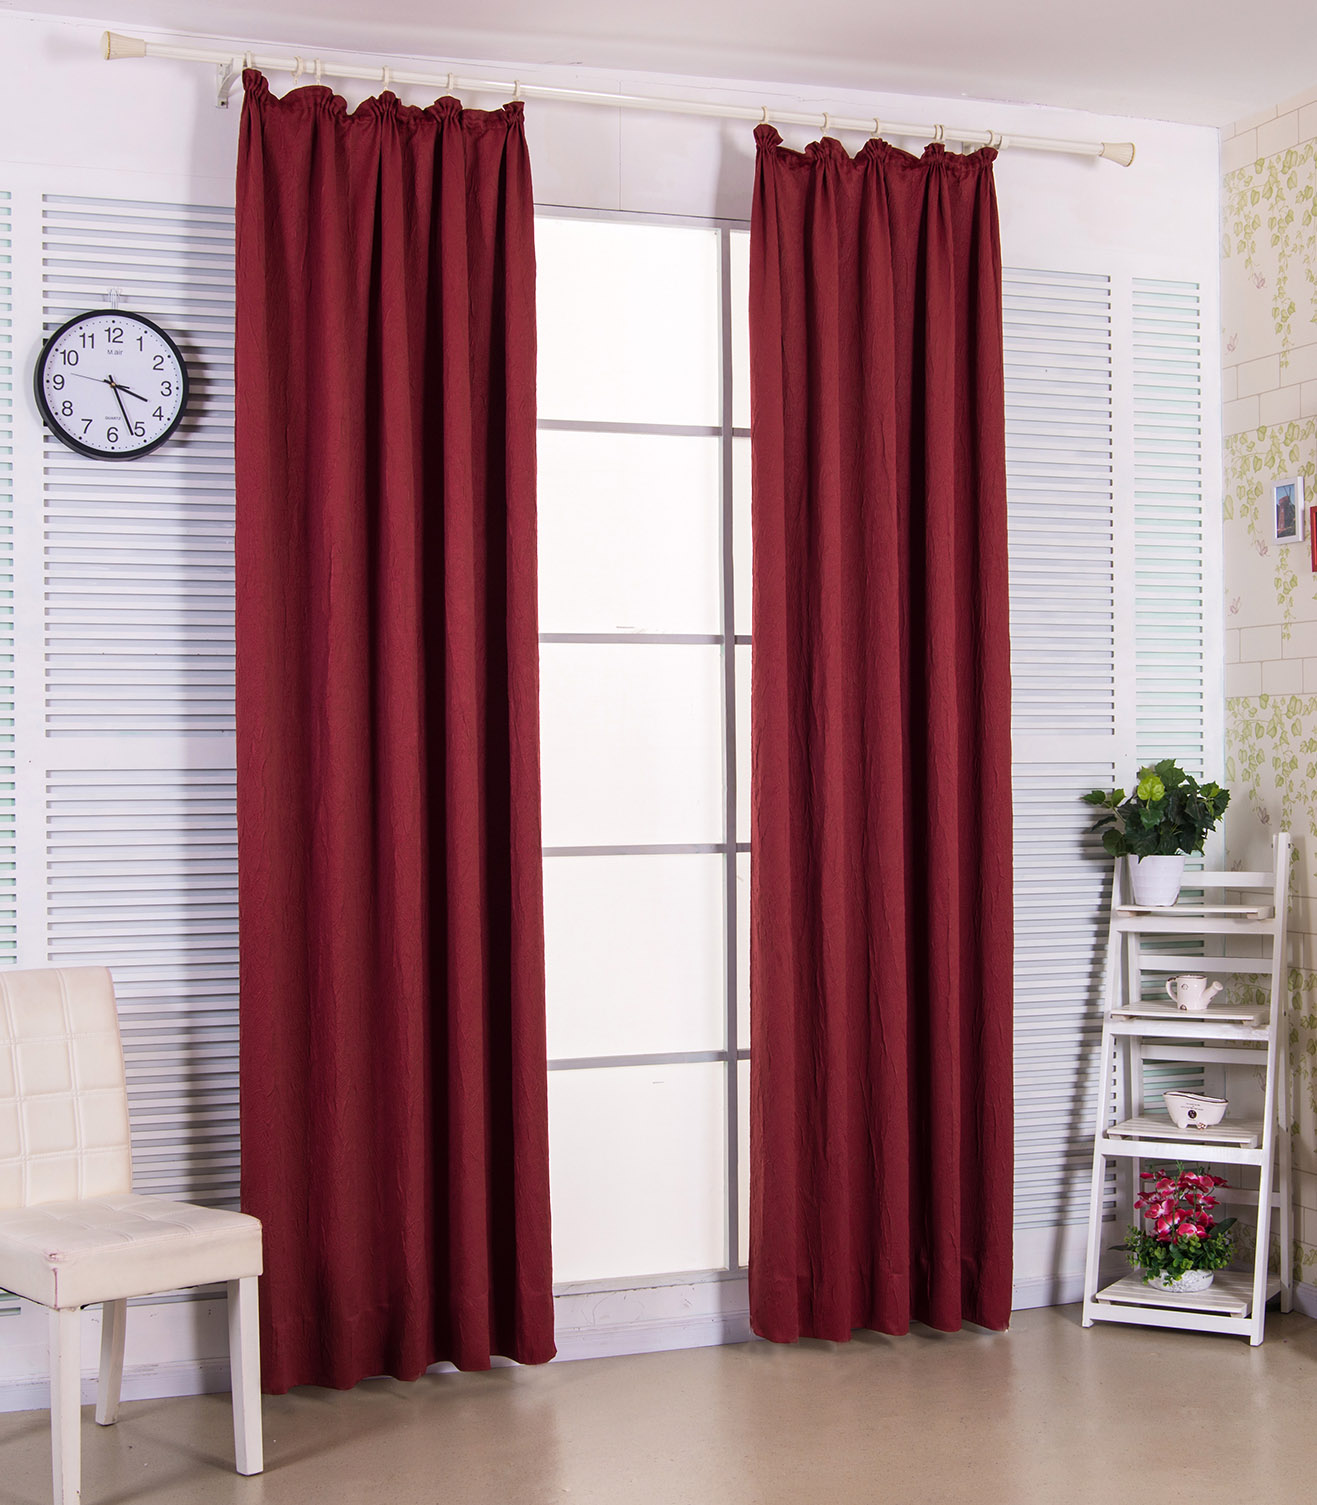 gardinen blickdicht vorhang kr uselband verdunkelung schal crush optik matt 699 ebay. Black Bedroom Furniture Sets. Home Design Ideas